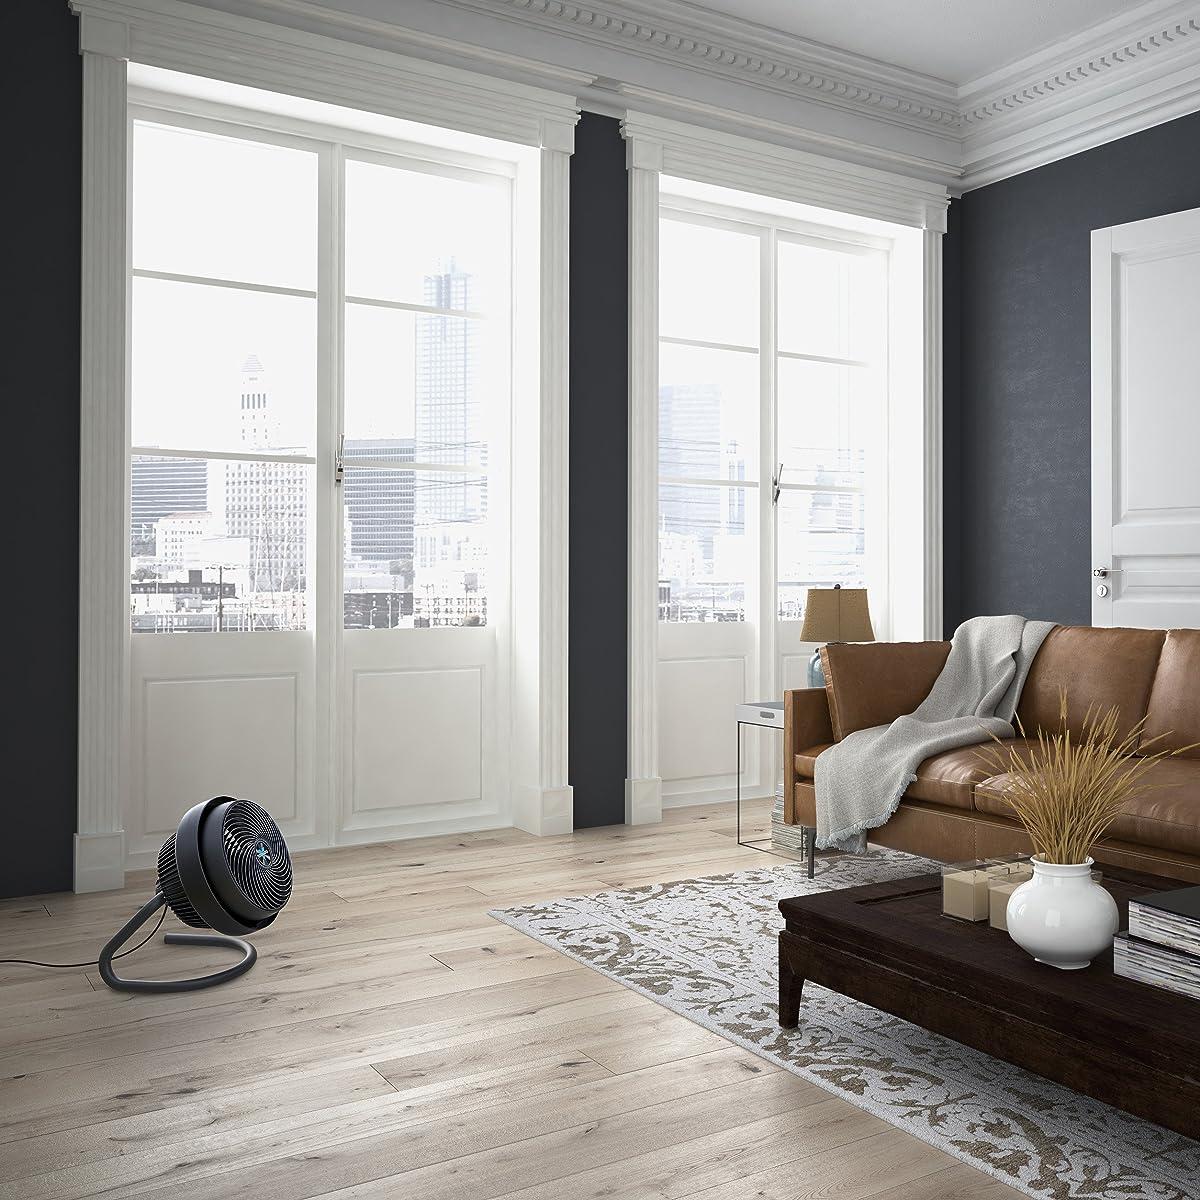 Vornado 723 Full-Size Whole Room Air Circulator